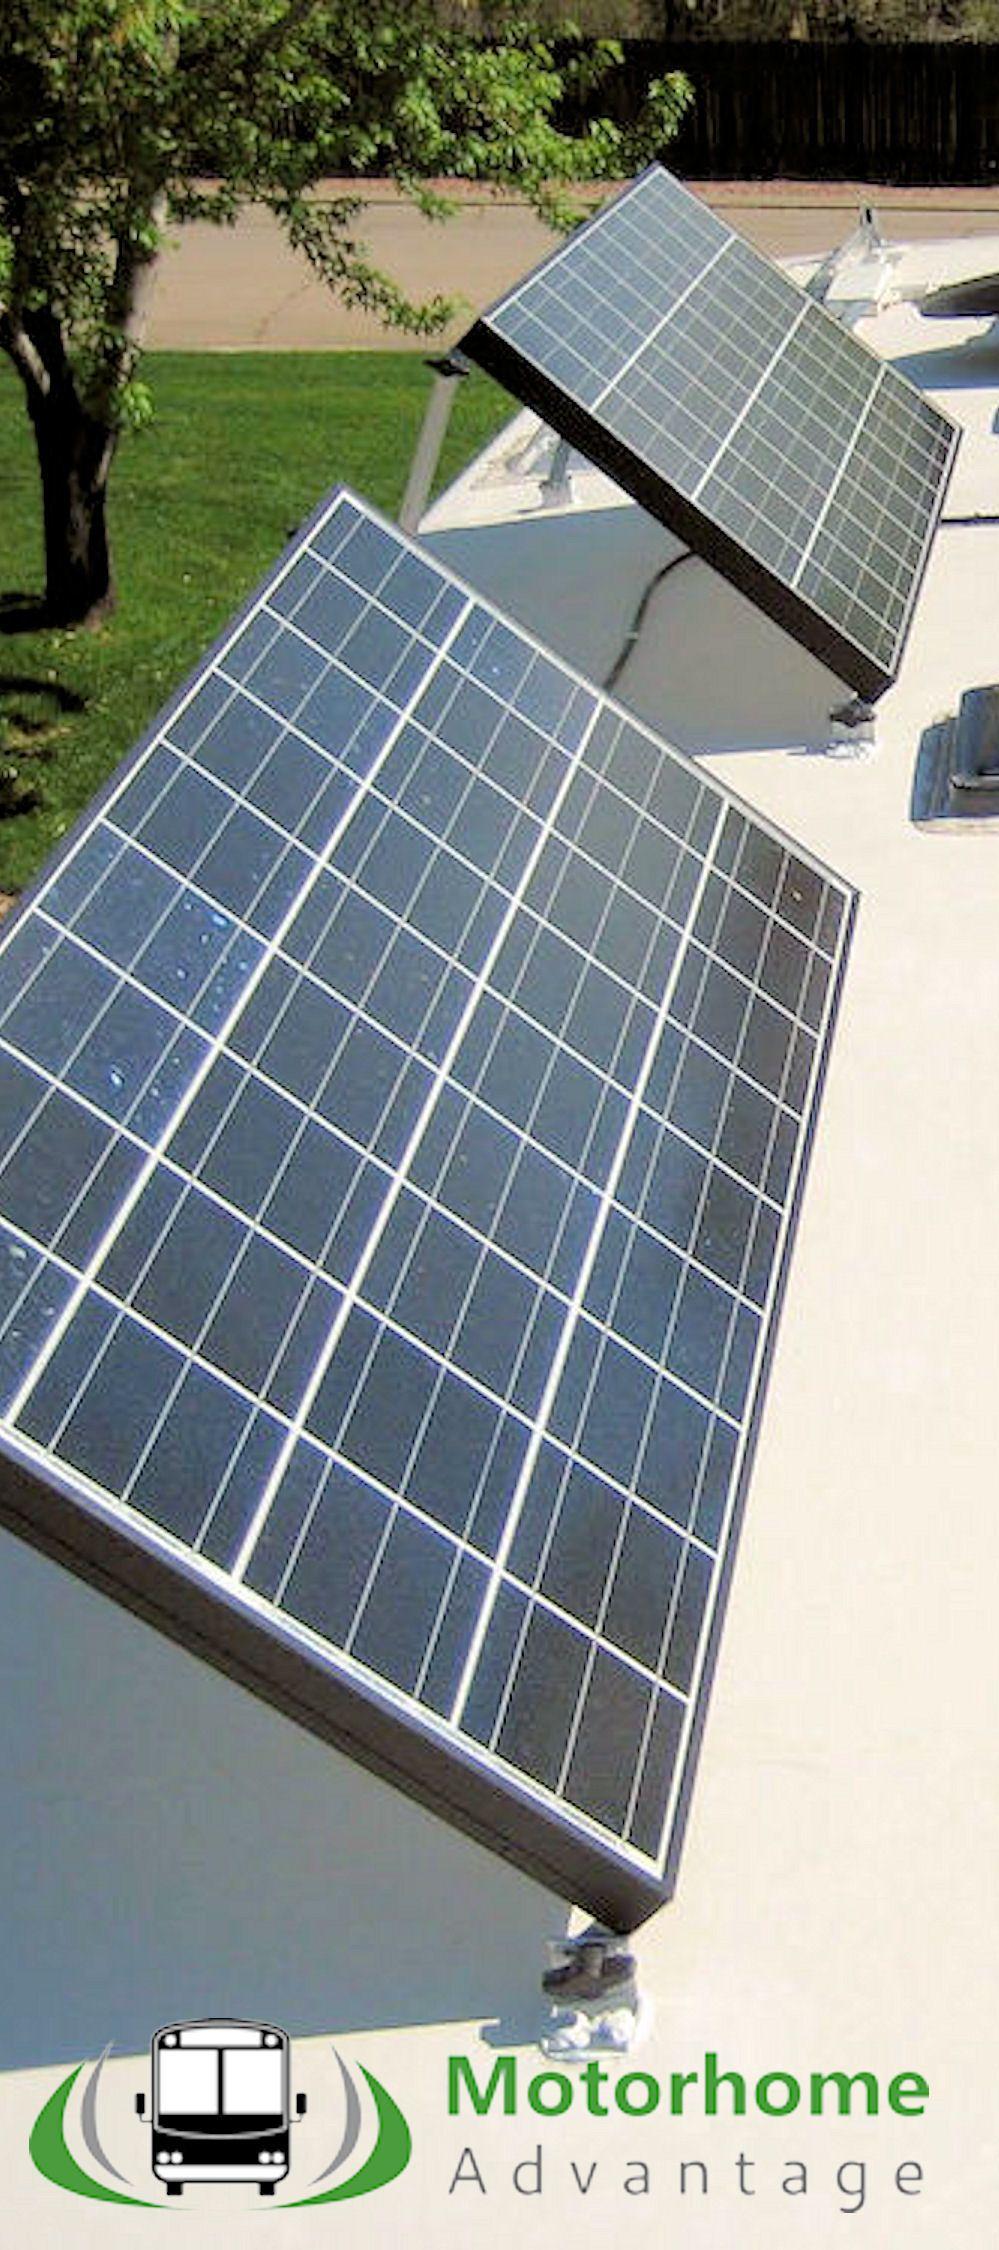 RV Solar: Systems, Kits & Set Up | Motorhome Advantage